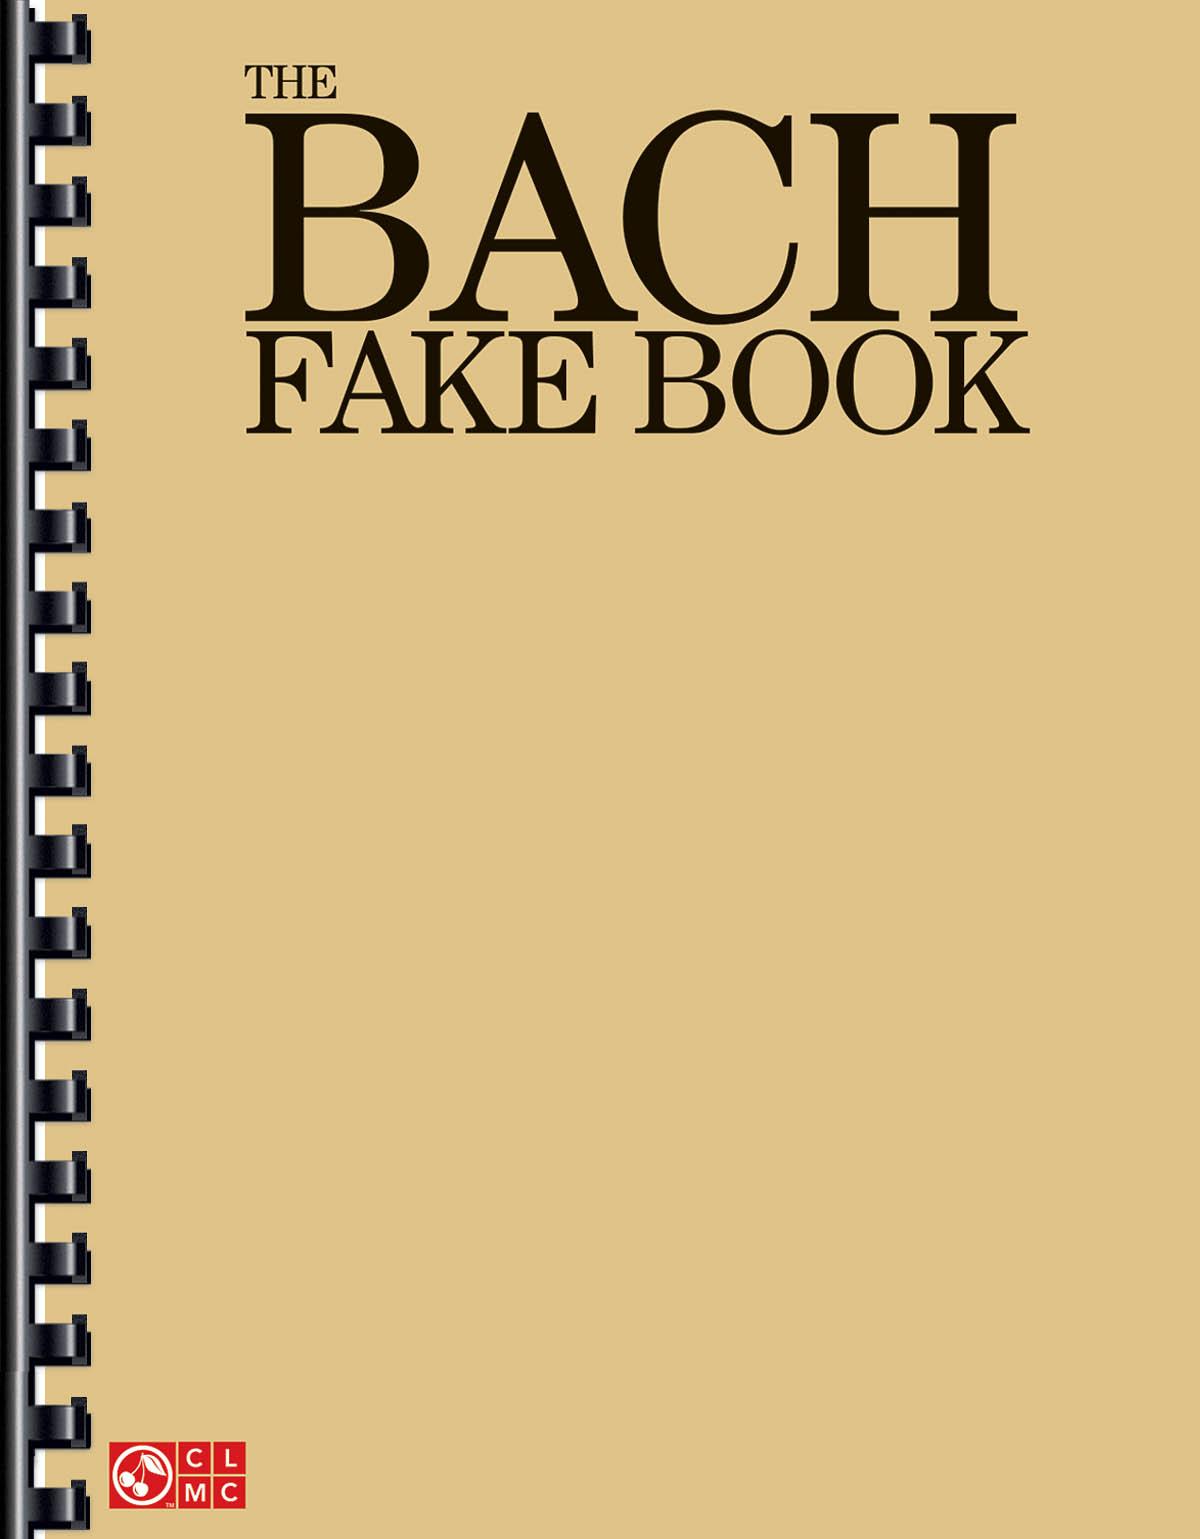 Johann Sebastian Bach: The Bach Fake Book: Piano: Artist Songbook